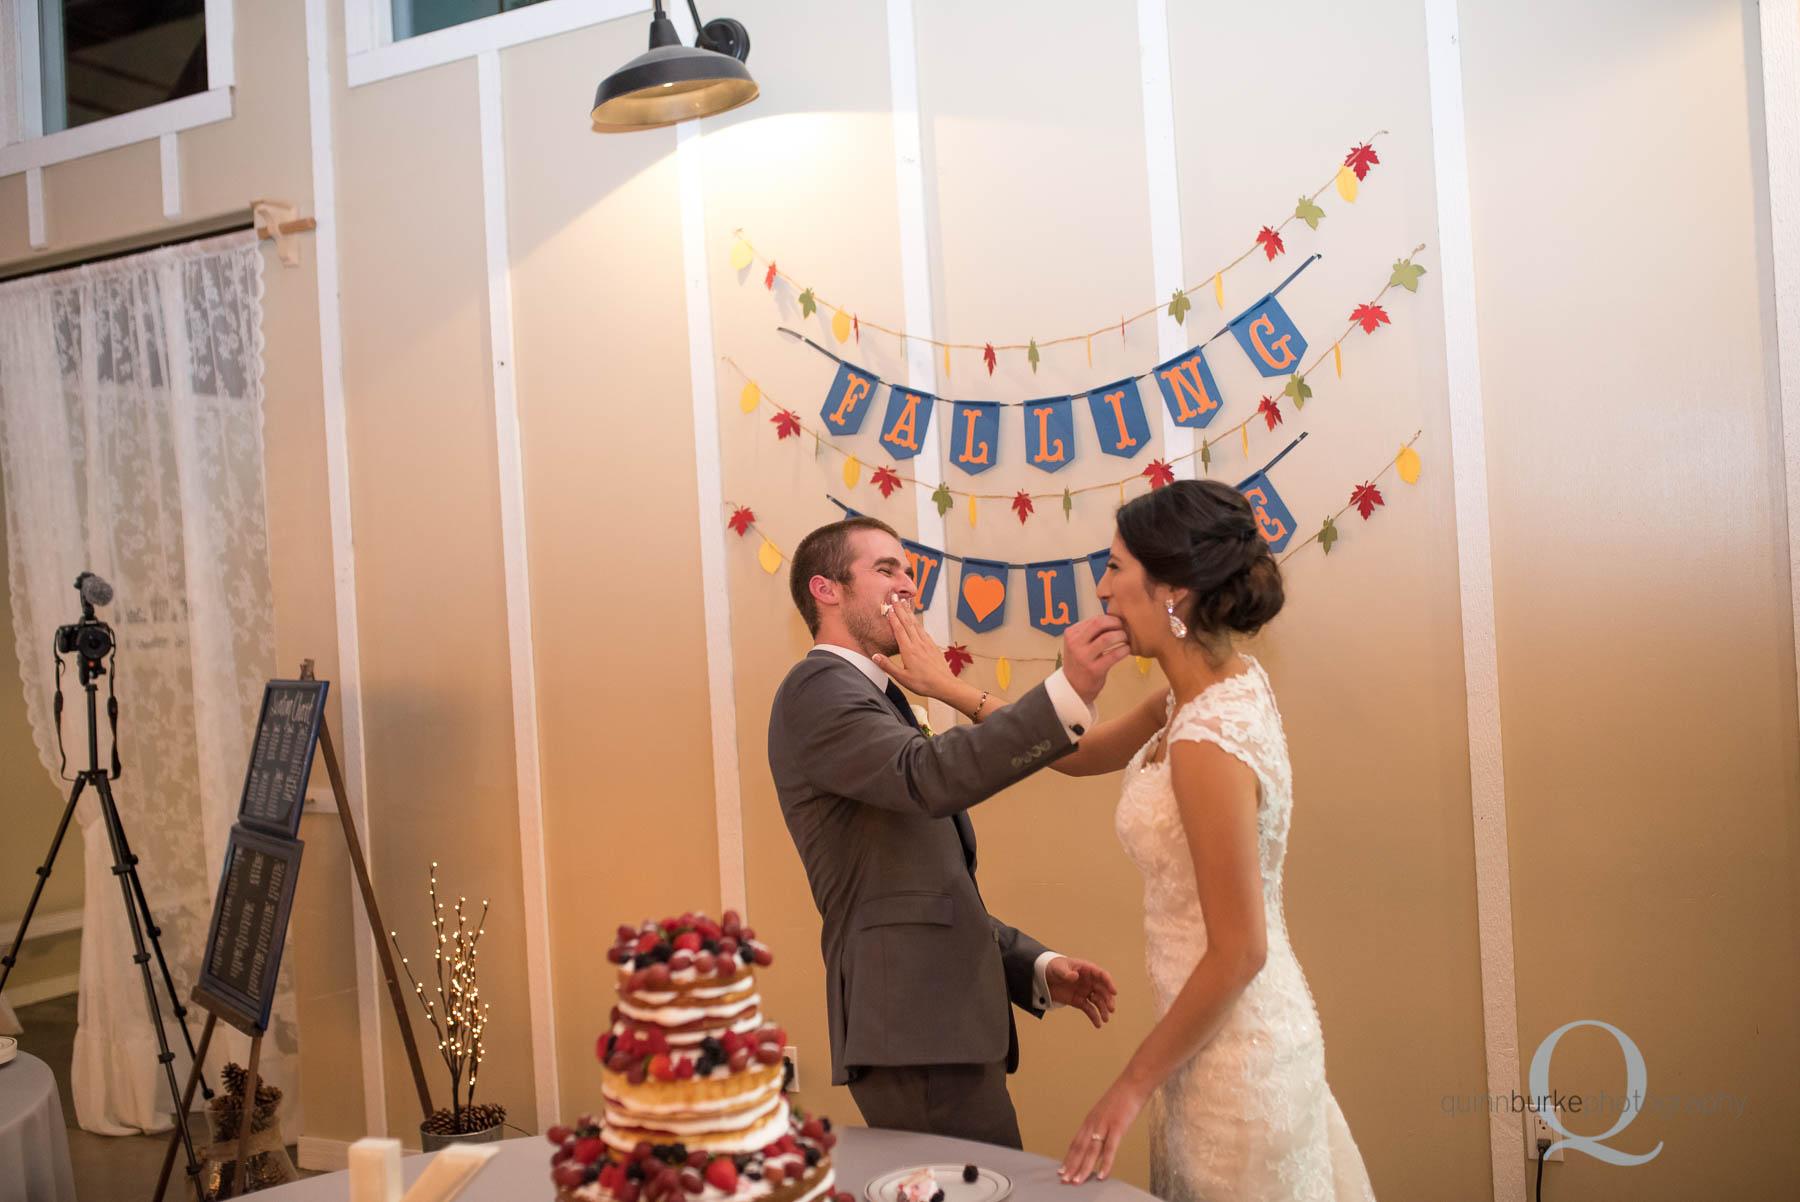 cake cutting during wedding reception Green Villa Barn